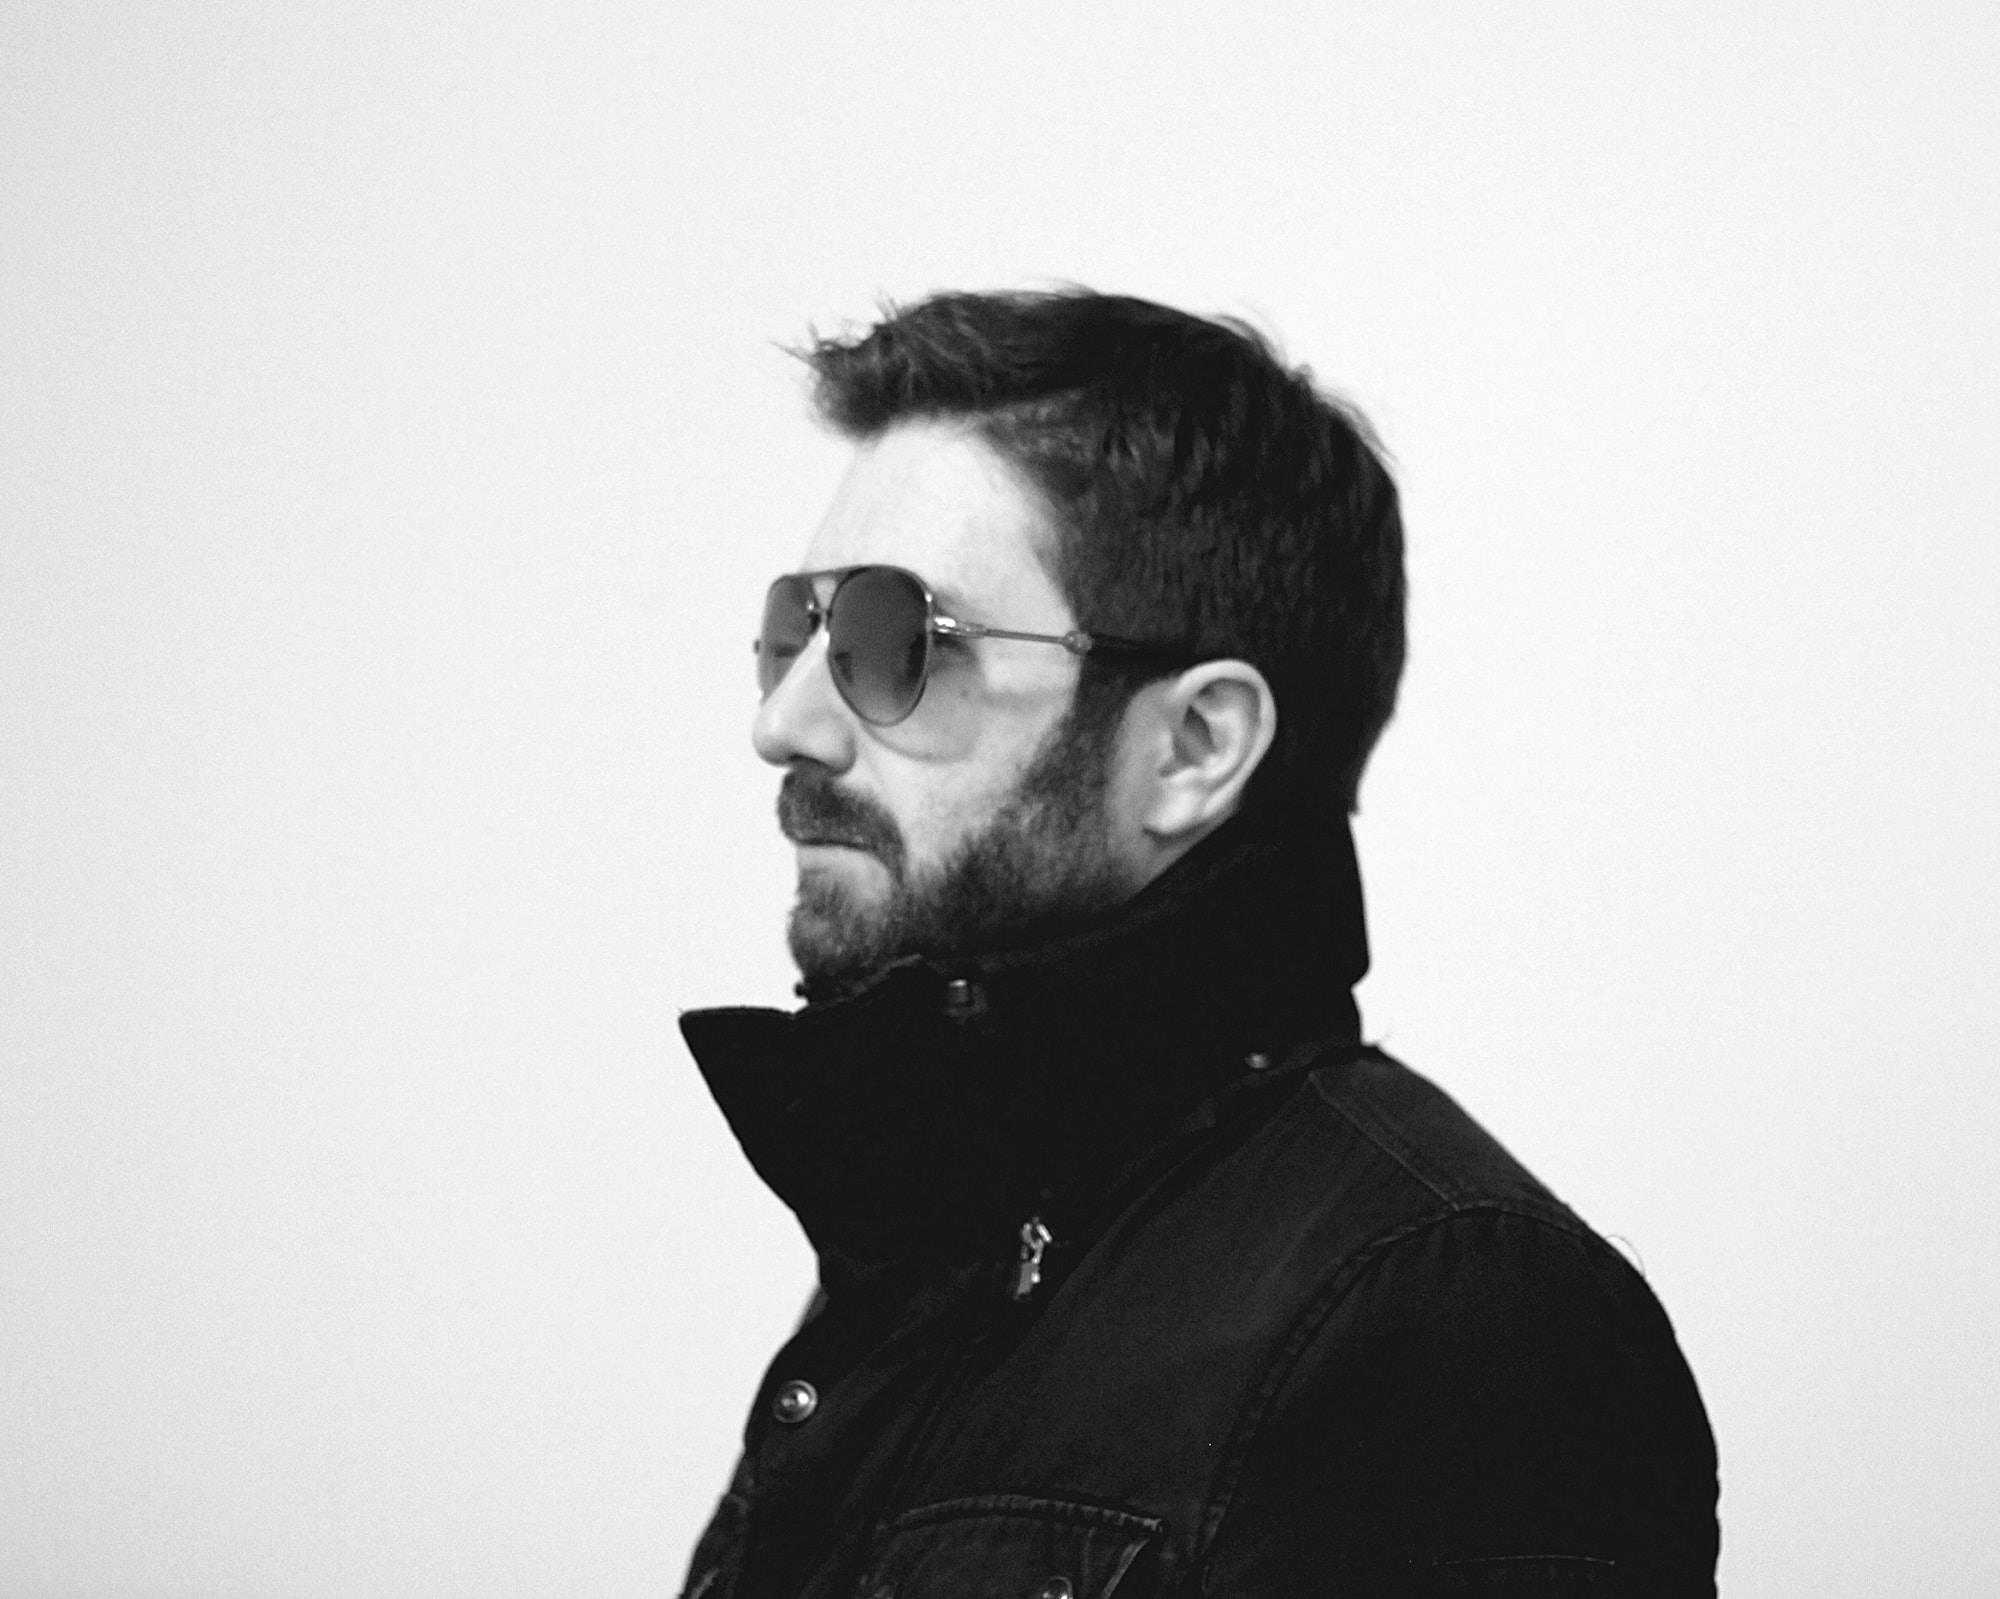 Go to Alexander Nachaj's profile